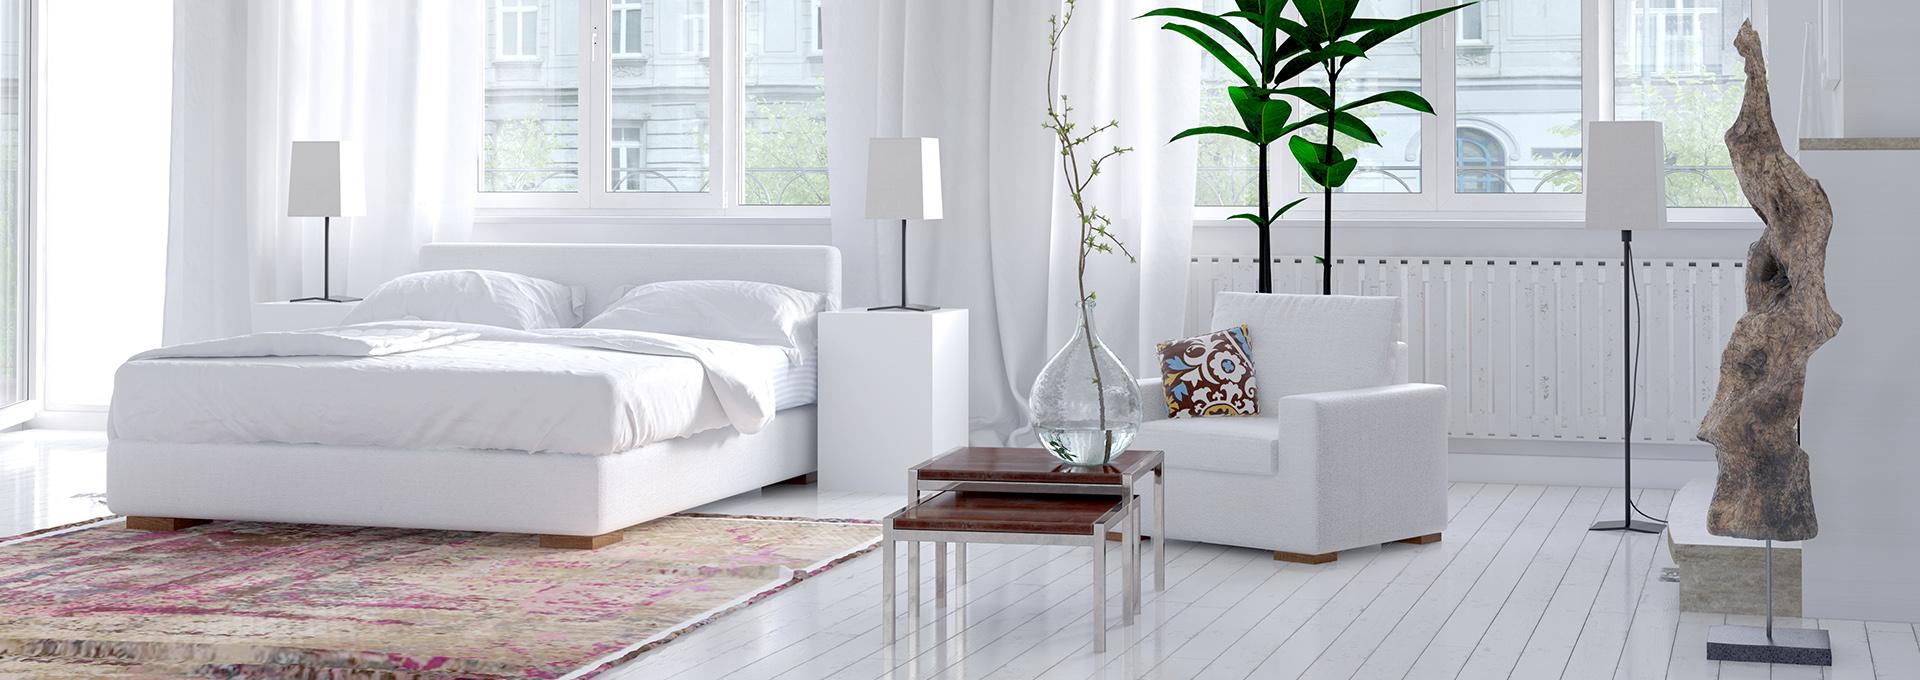 gesunder schlaf mit th mling matratzen th mling matratzenmanufaktur. Black Bedroom Furniture Sets. Home Design Ideas